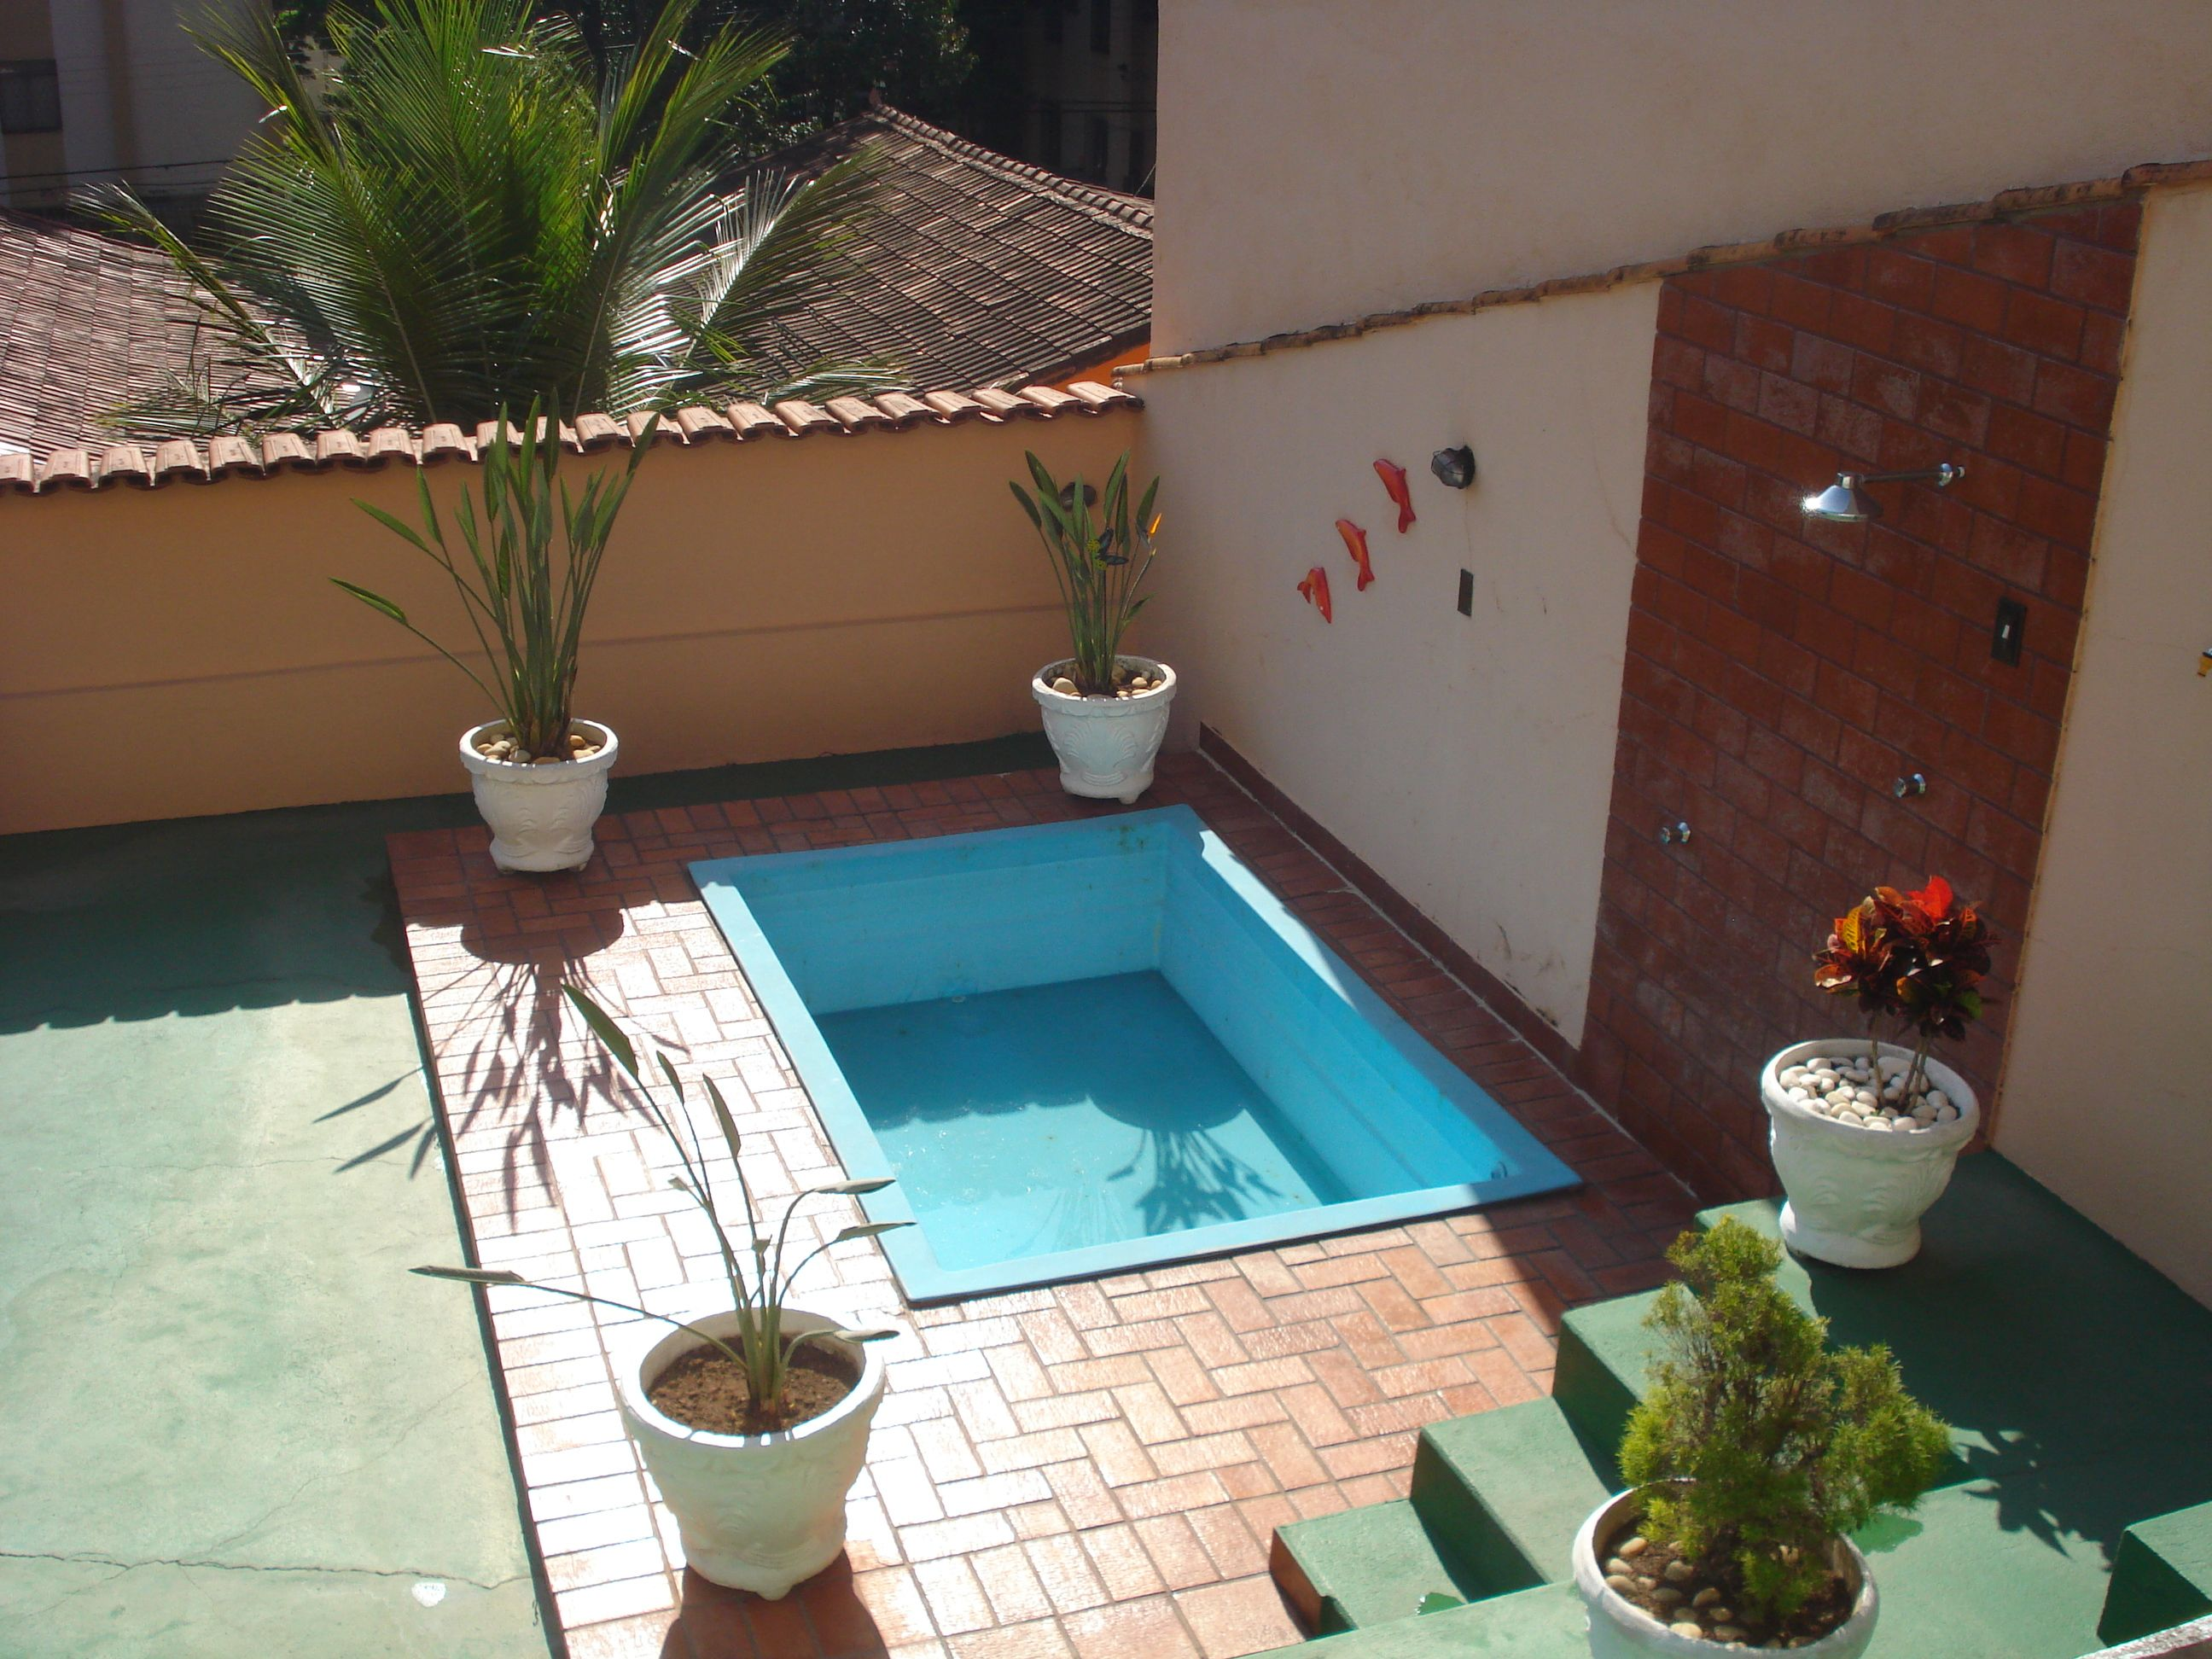 Casa com piscina pequena pesquisa google id es pour la - Piscina prefabricada pequena ...